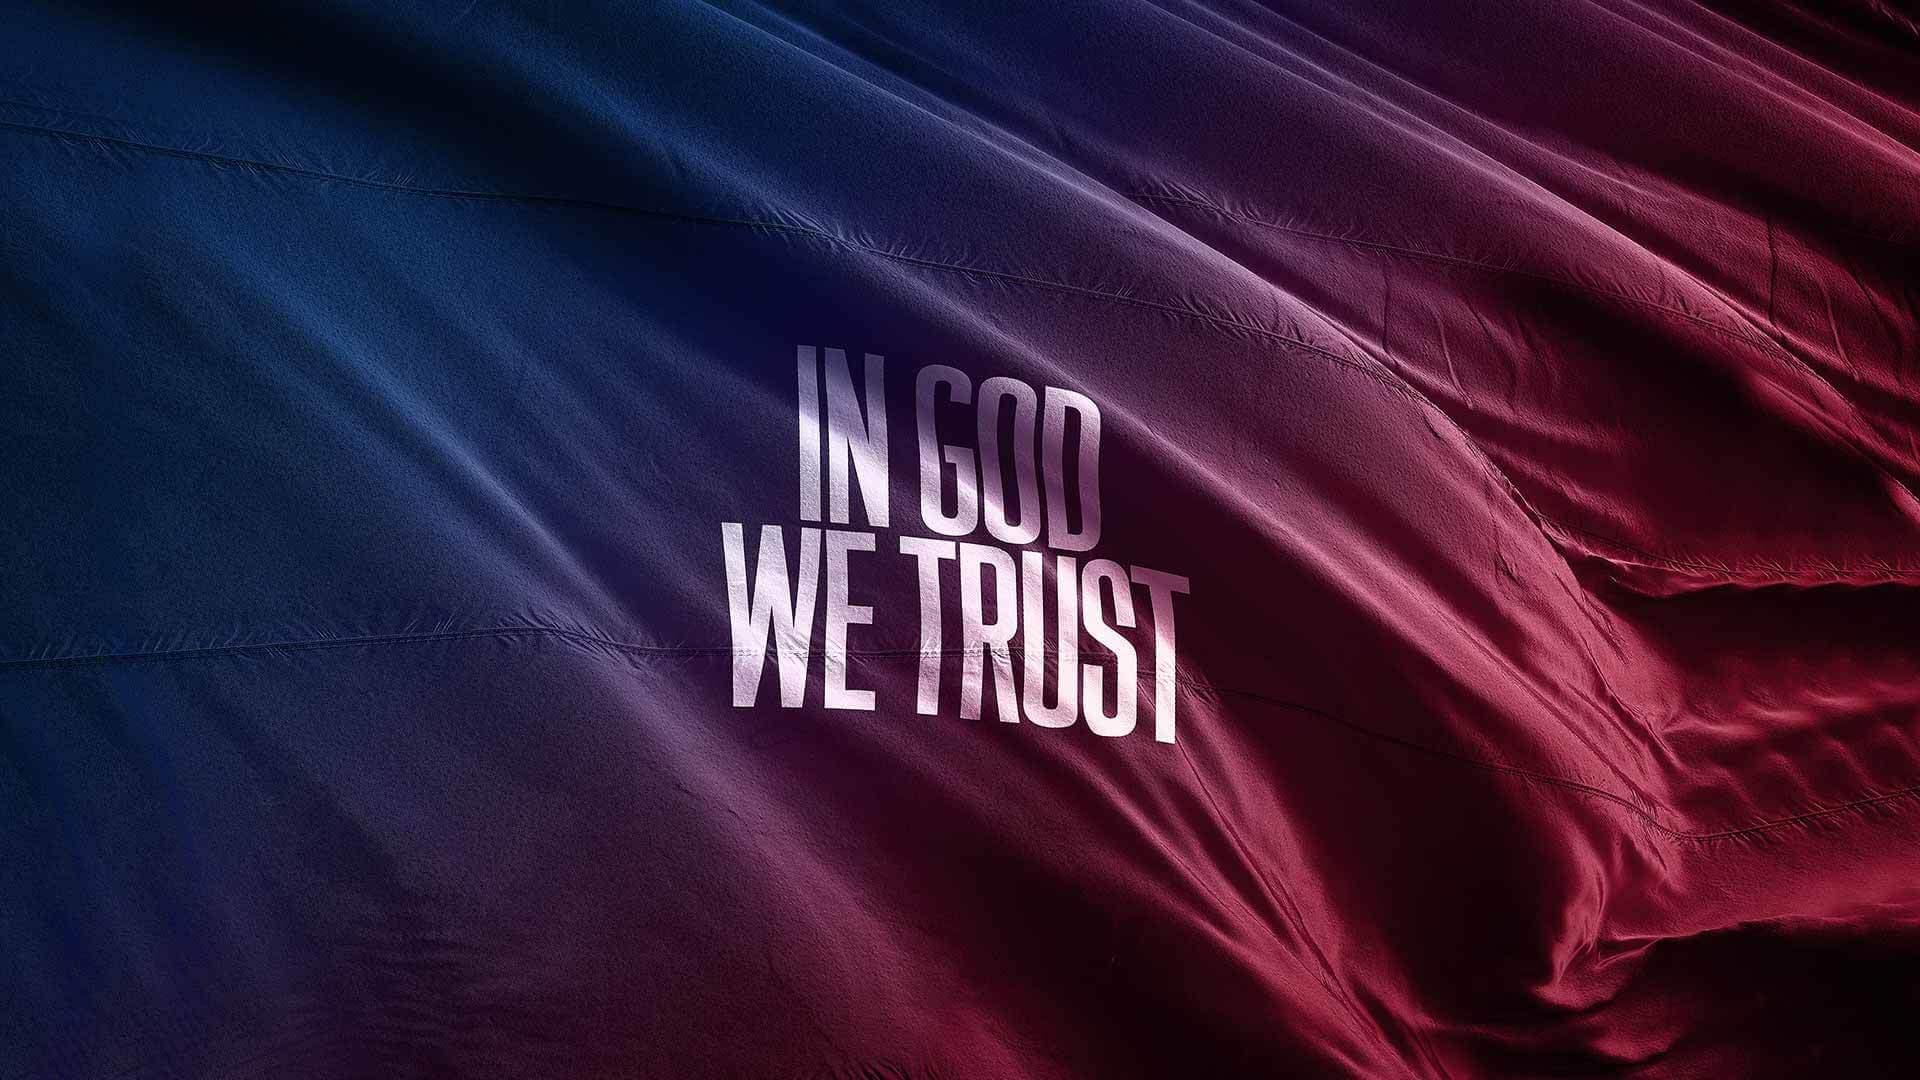 In-God-We-Trust-1920x1080-web.jpg